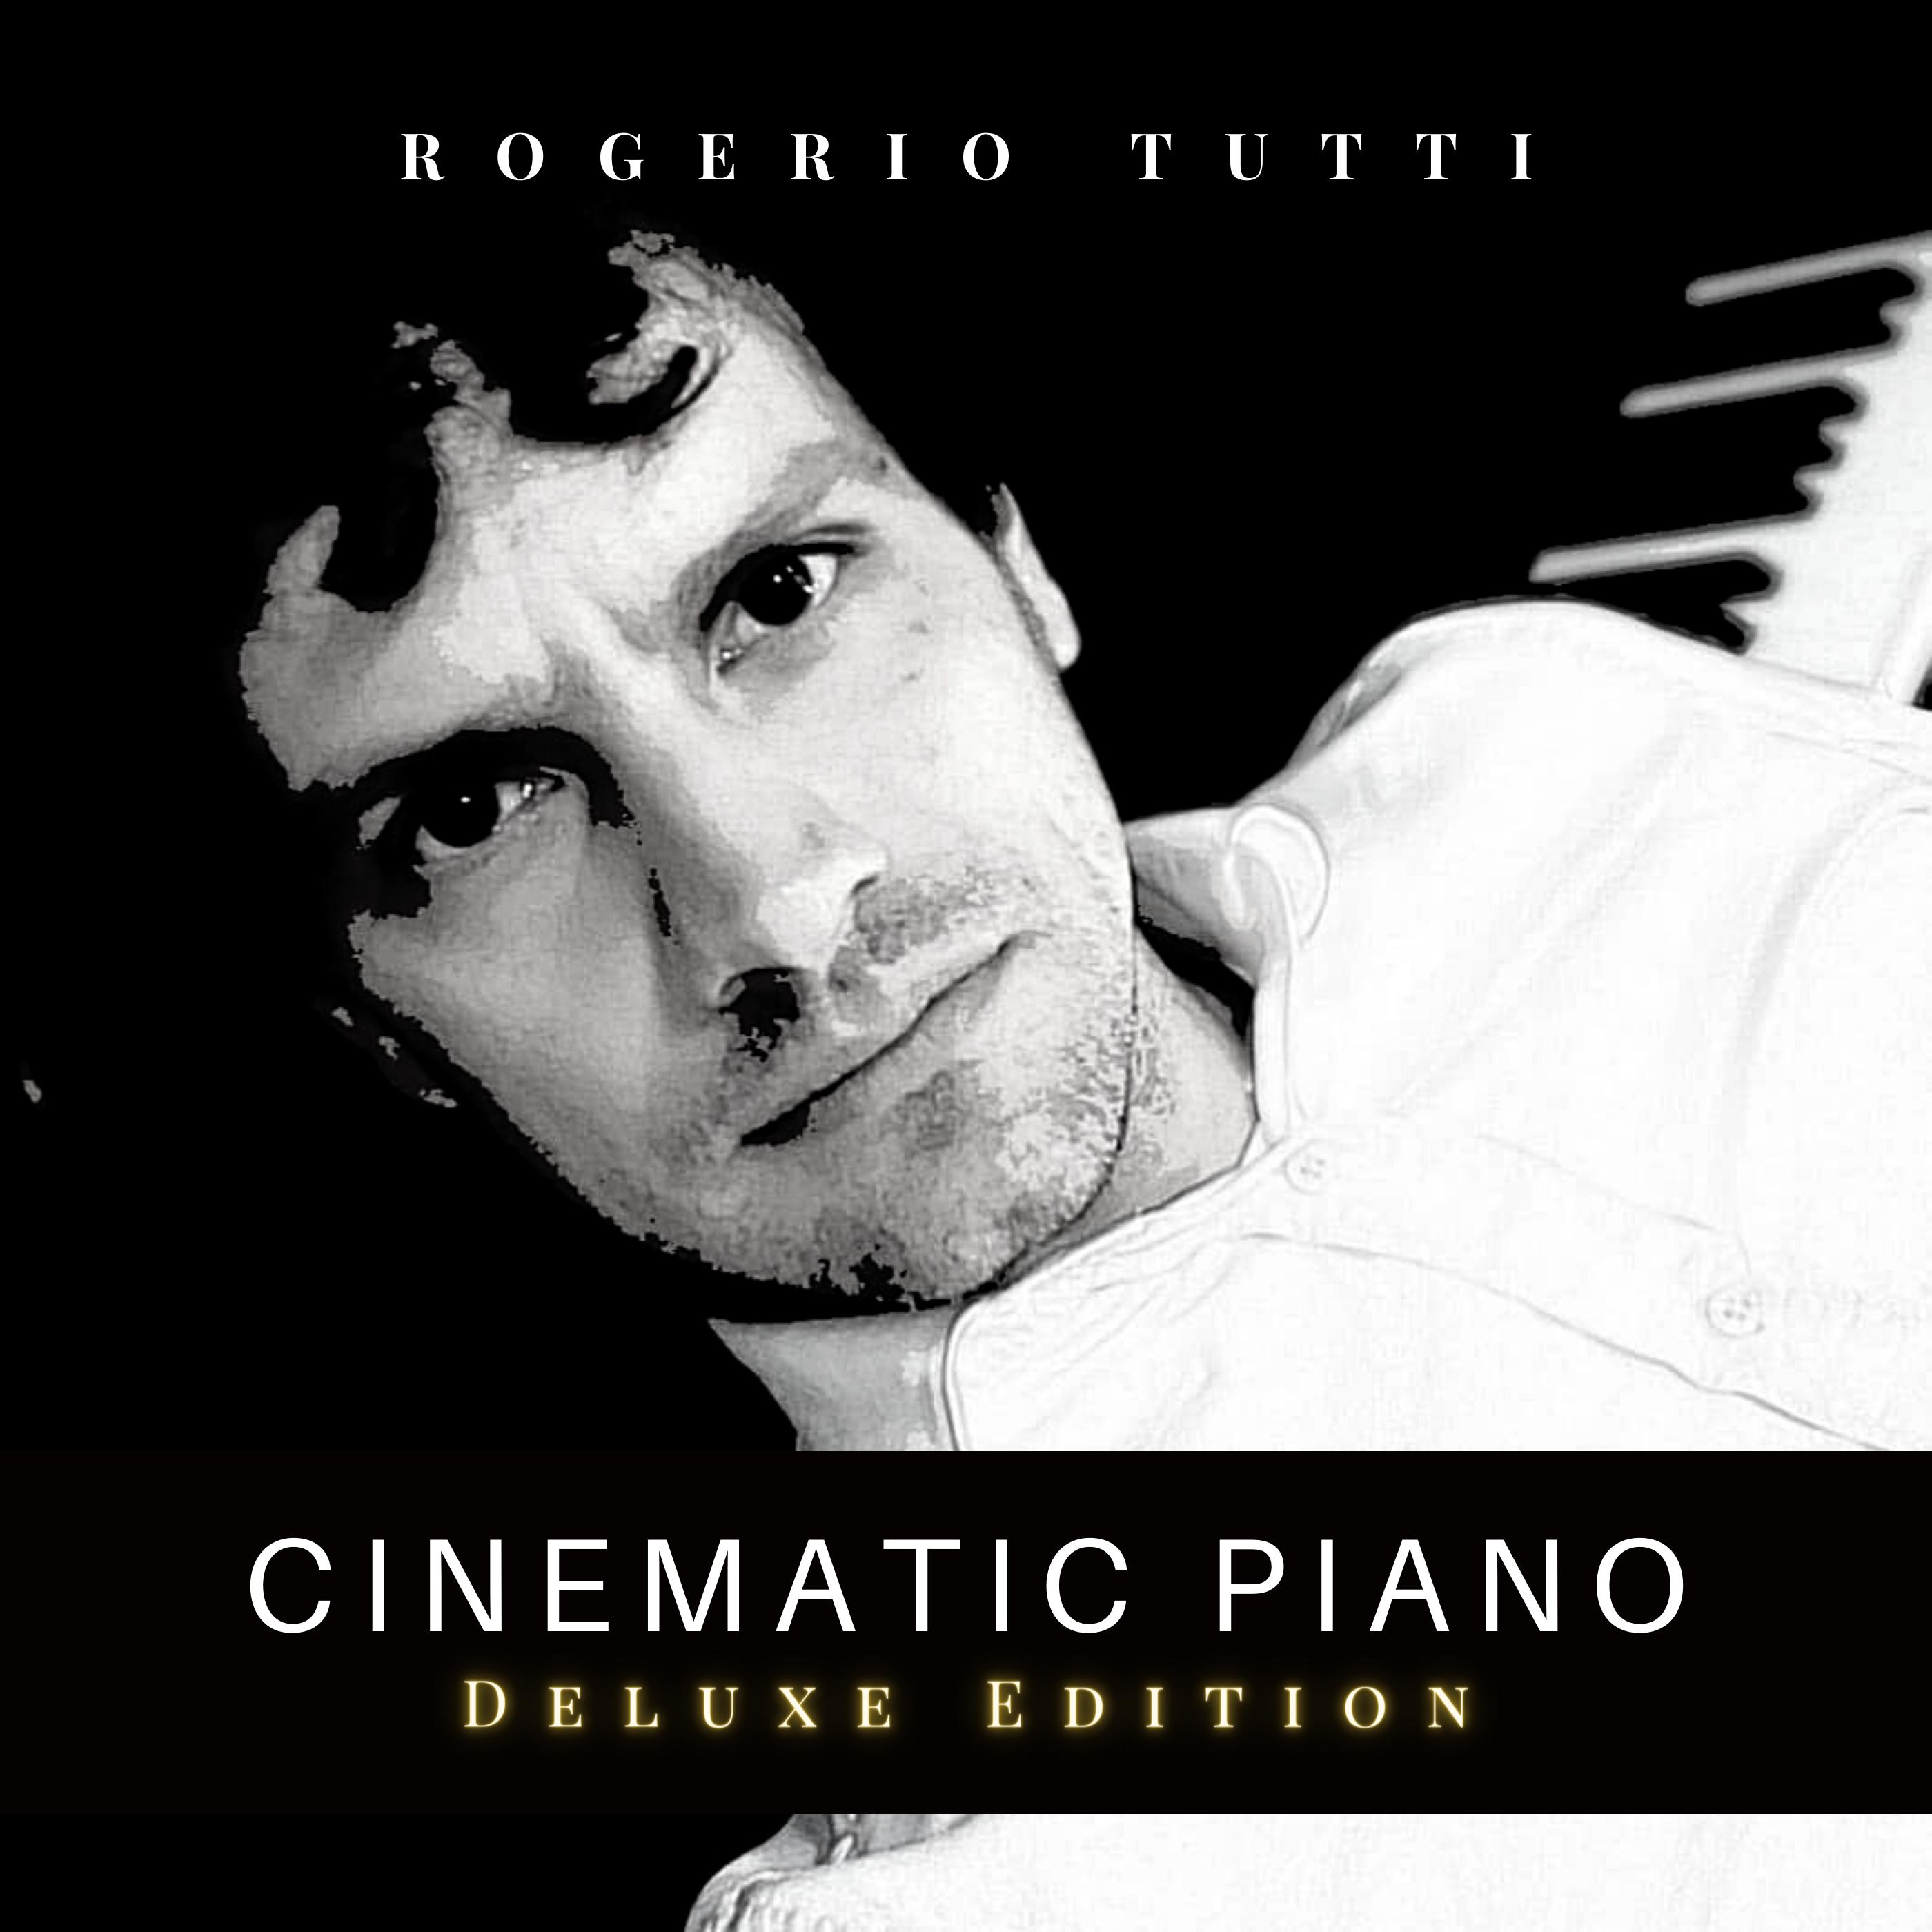 Cinematic Piano (Deluxe Edition)